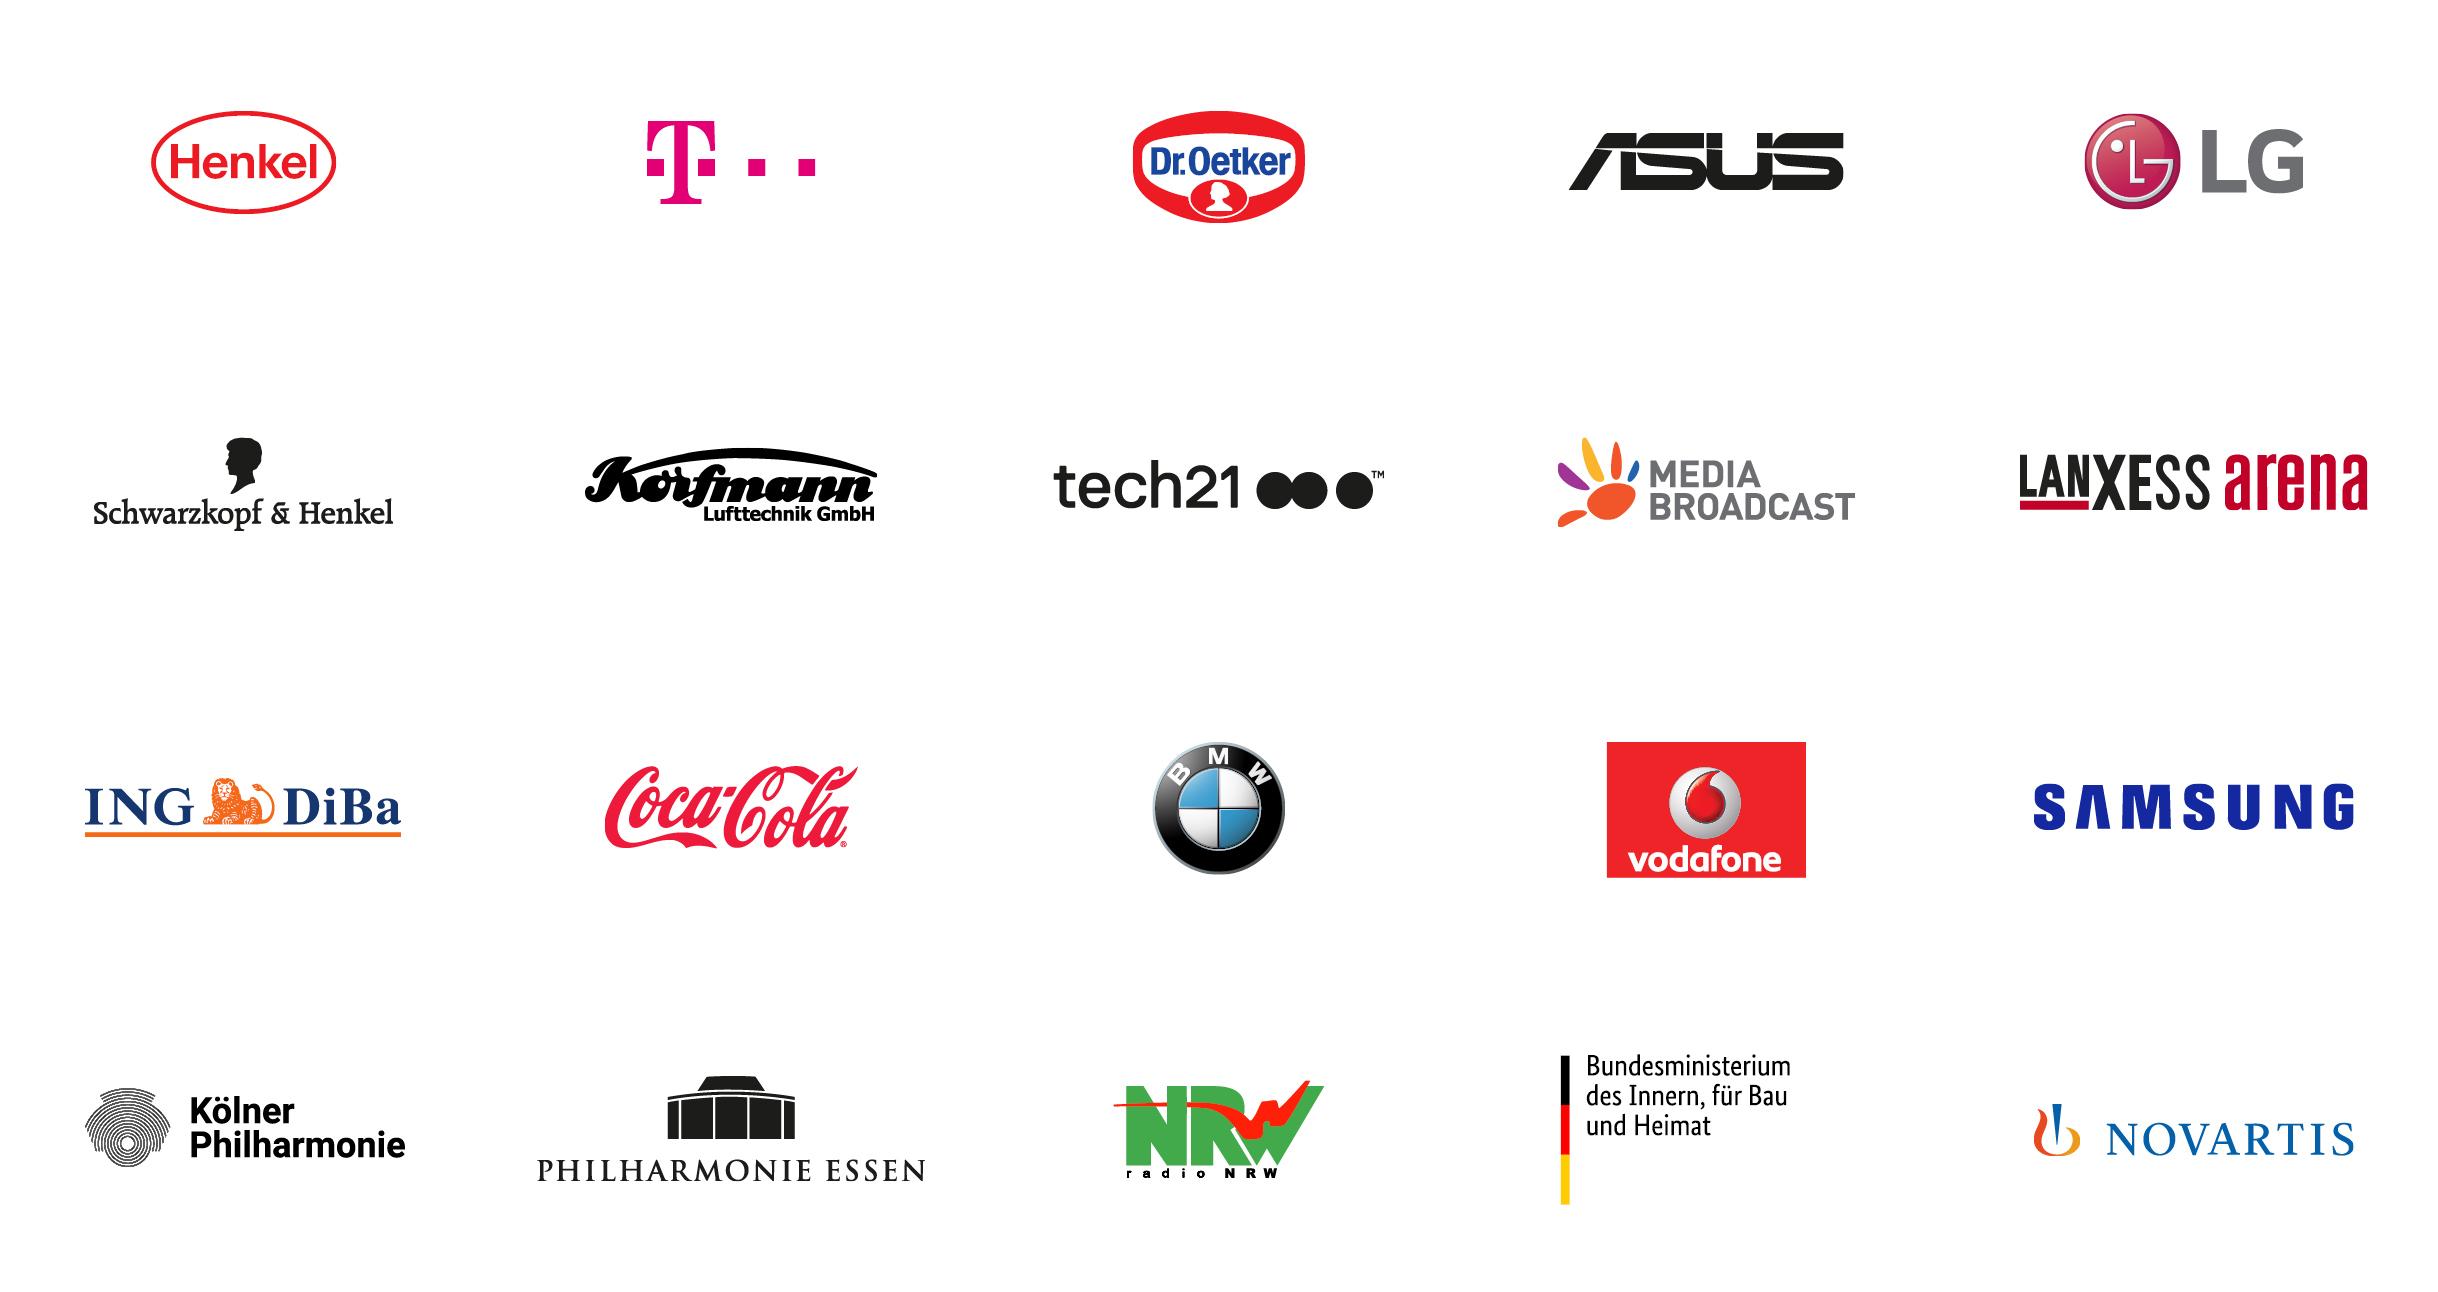 Henkel, Telekom, Dr. Oetker, Asus, LG, Schwarzkopf, Korfmann, Tech 21, Media Broadcast, Lanxess Arena, Ing Diba, Coca Cola, BMW, Vodafone, Samsung, Kölner Philharmonie, Philharmonie Essen, Radio NRW, Bundesministerium des Innern, Novartis